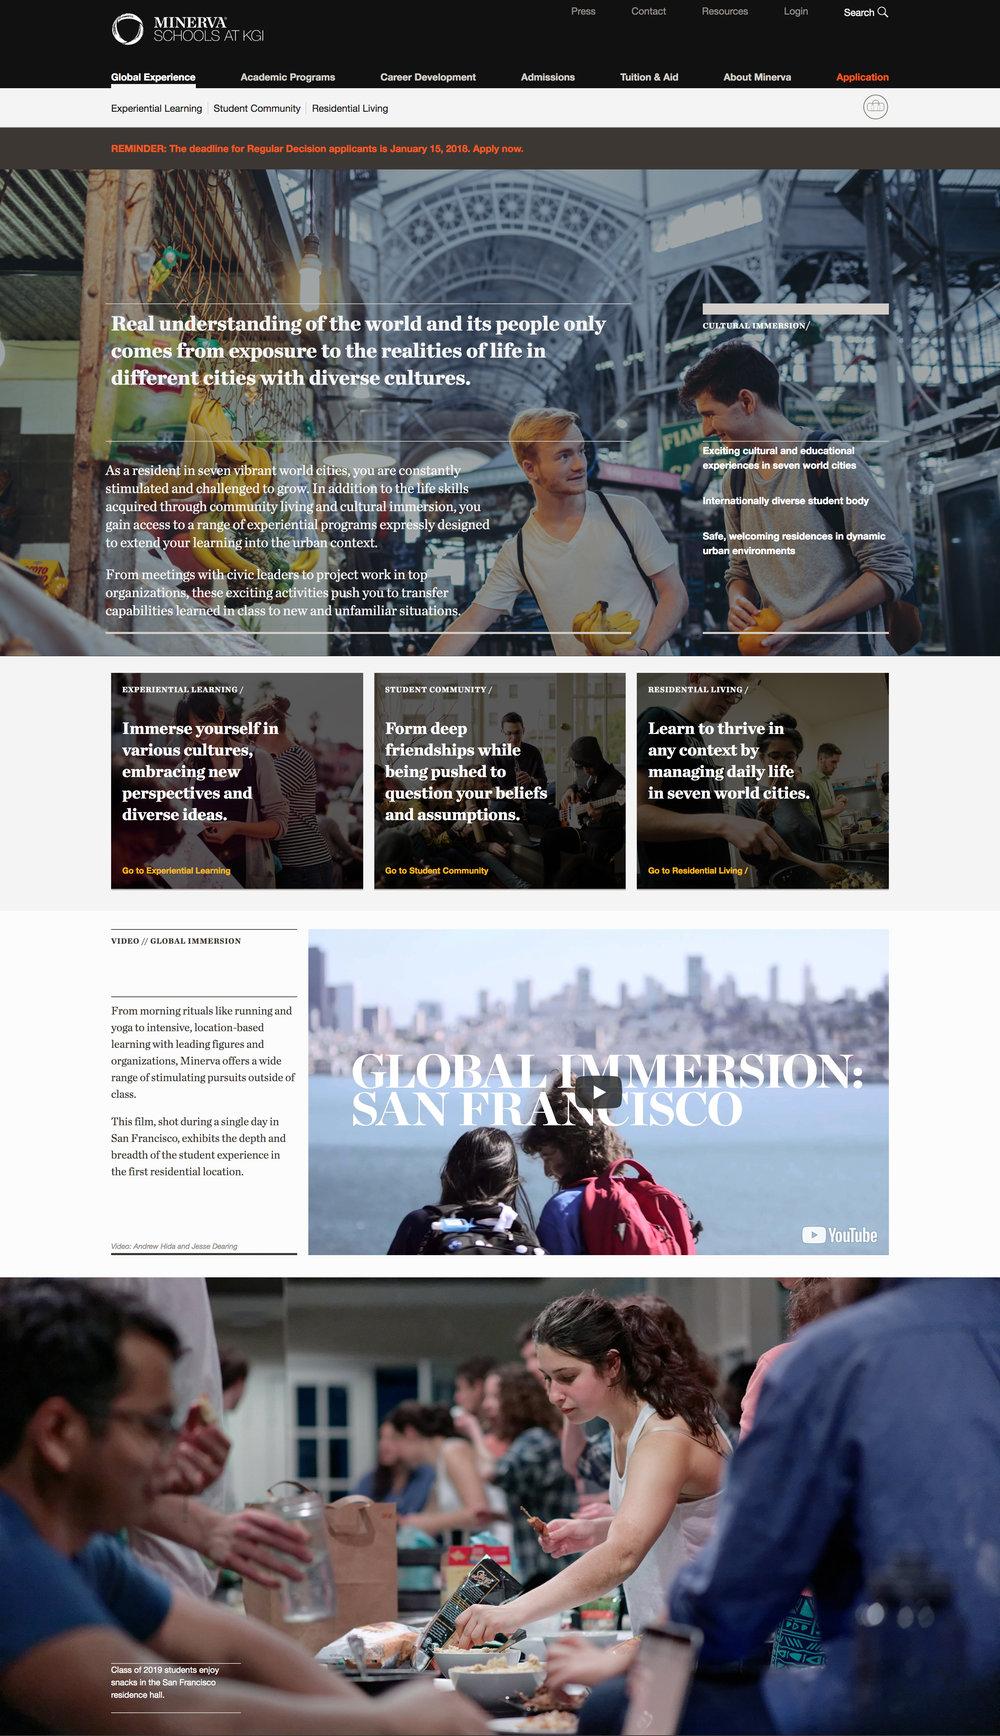 2018 Minerva Home page.jpg